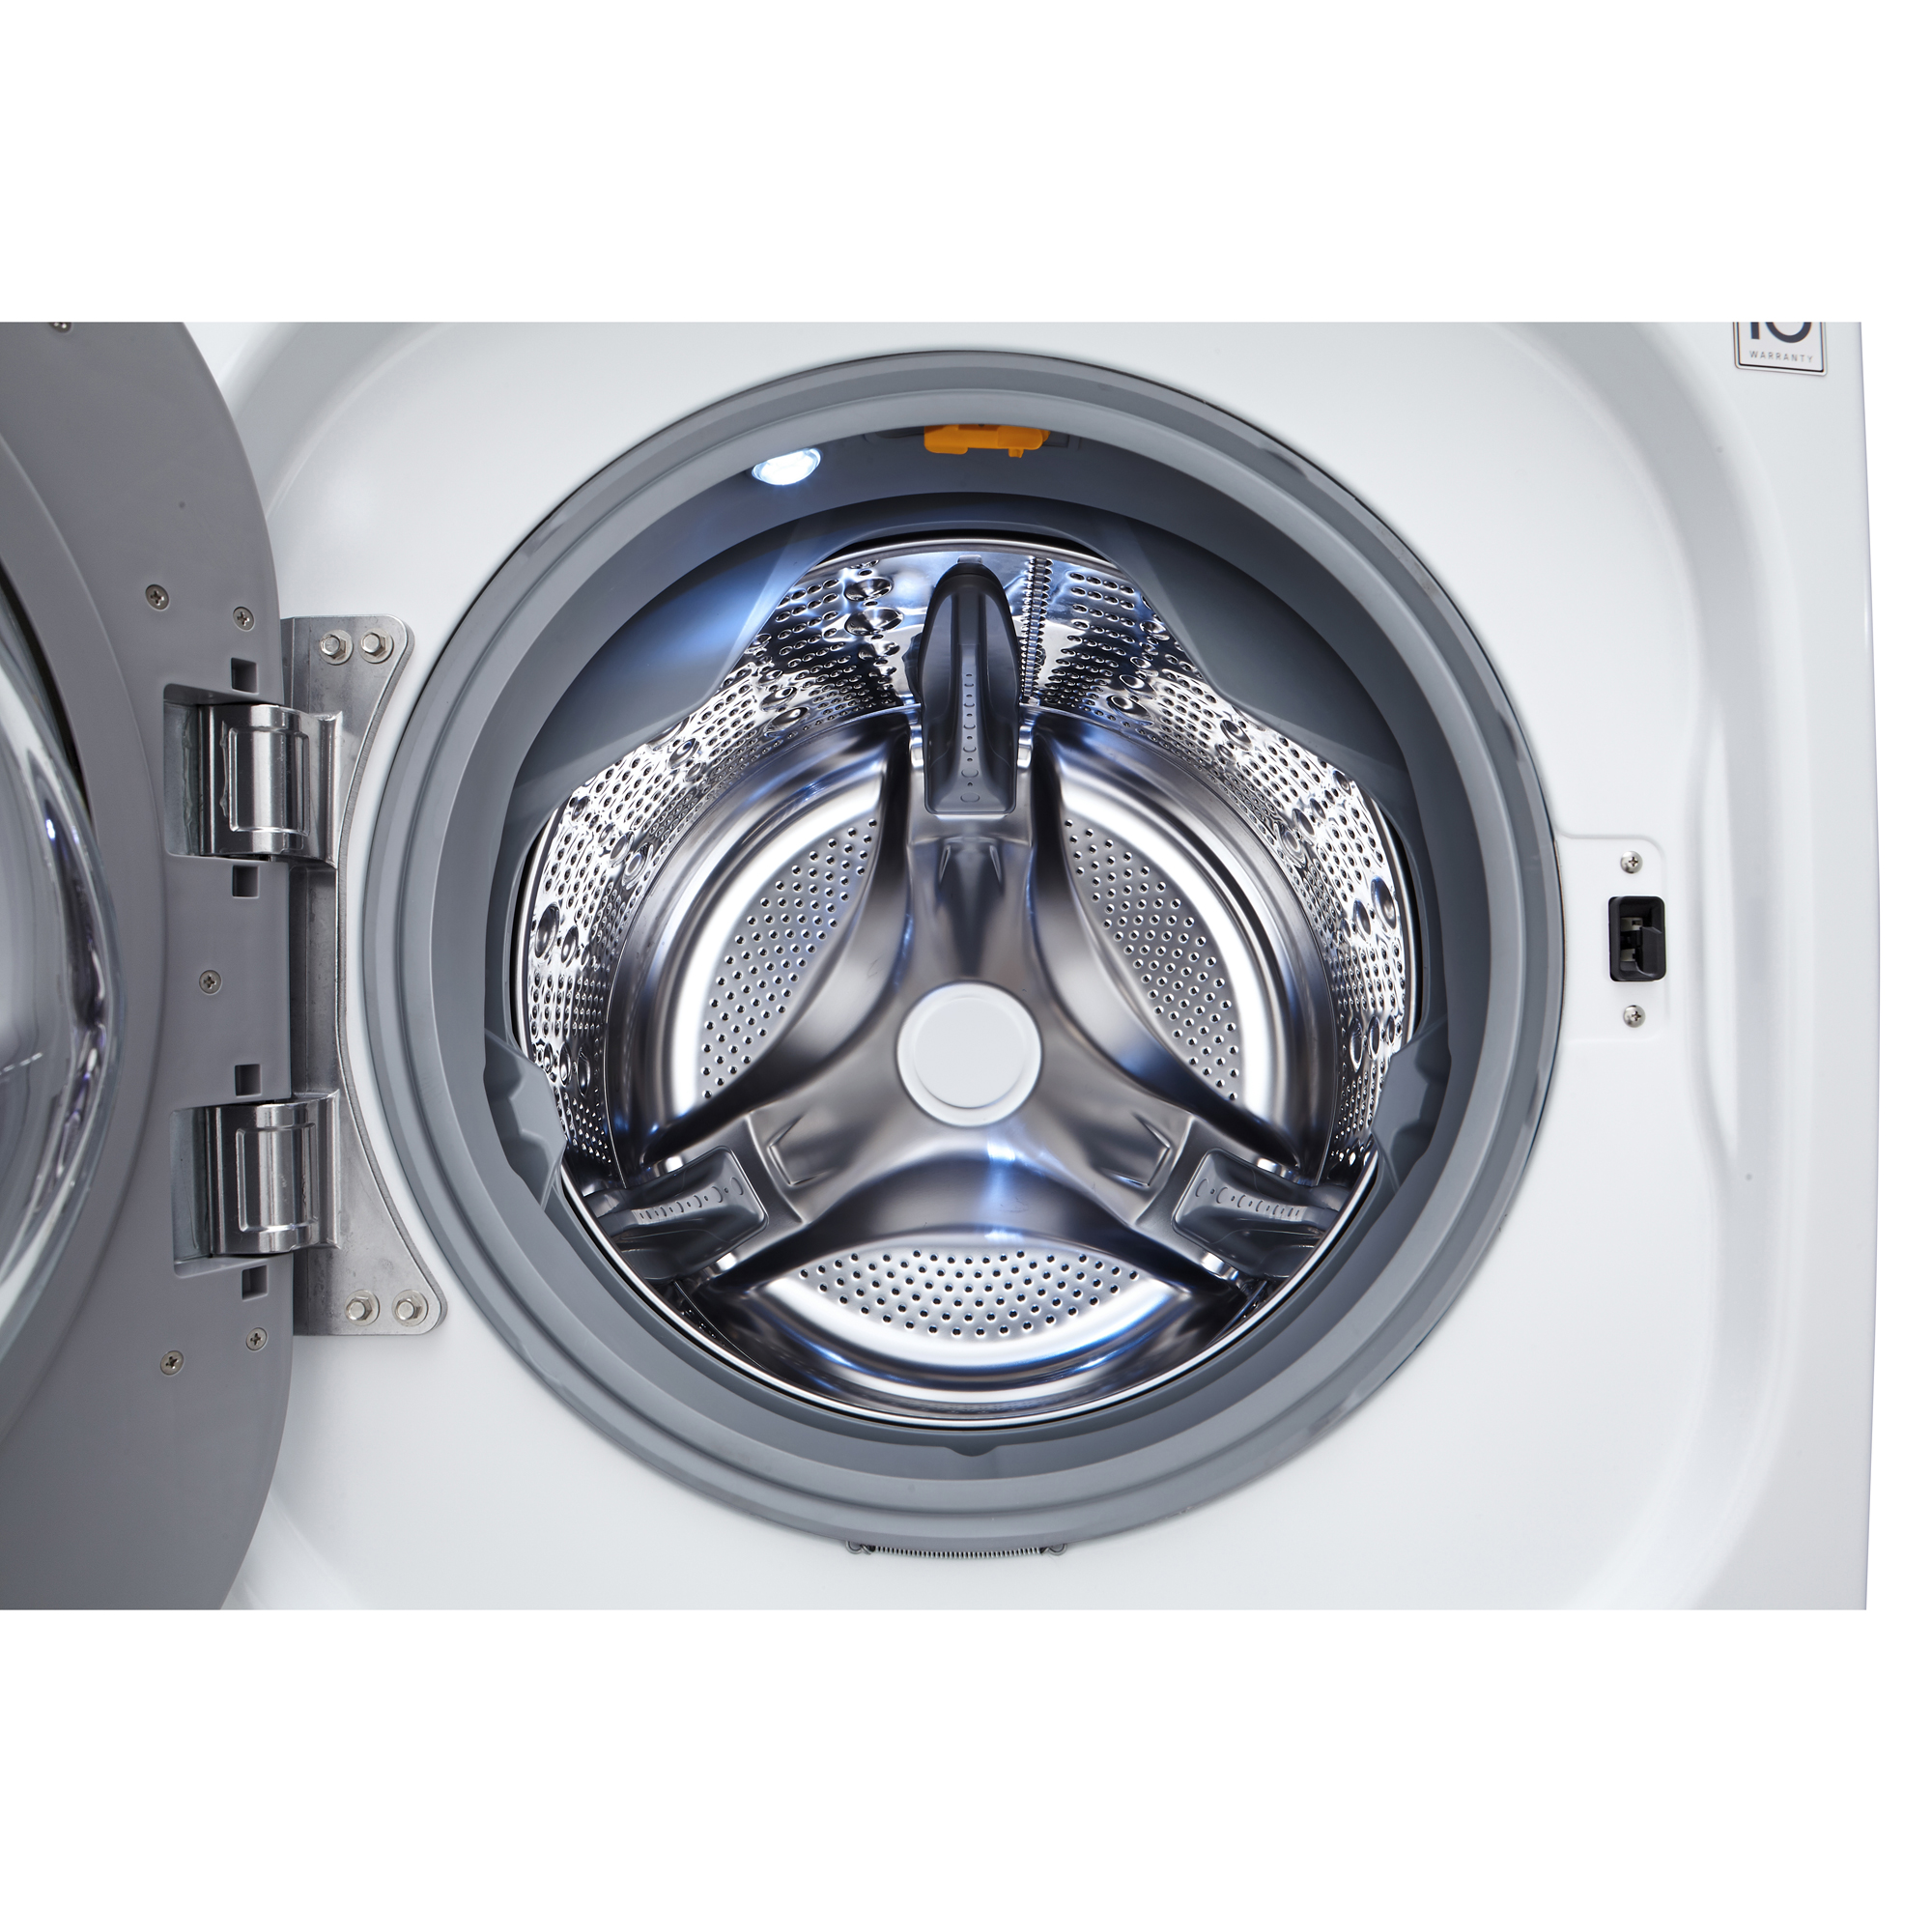 LG WM4270HWA 4.5 cu. ft. Front Load Washer w/ TurboWash™ Technology – White